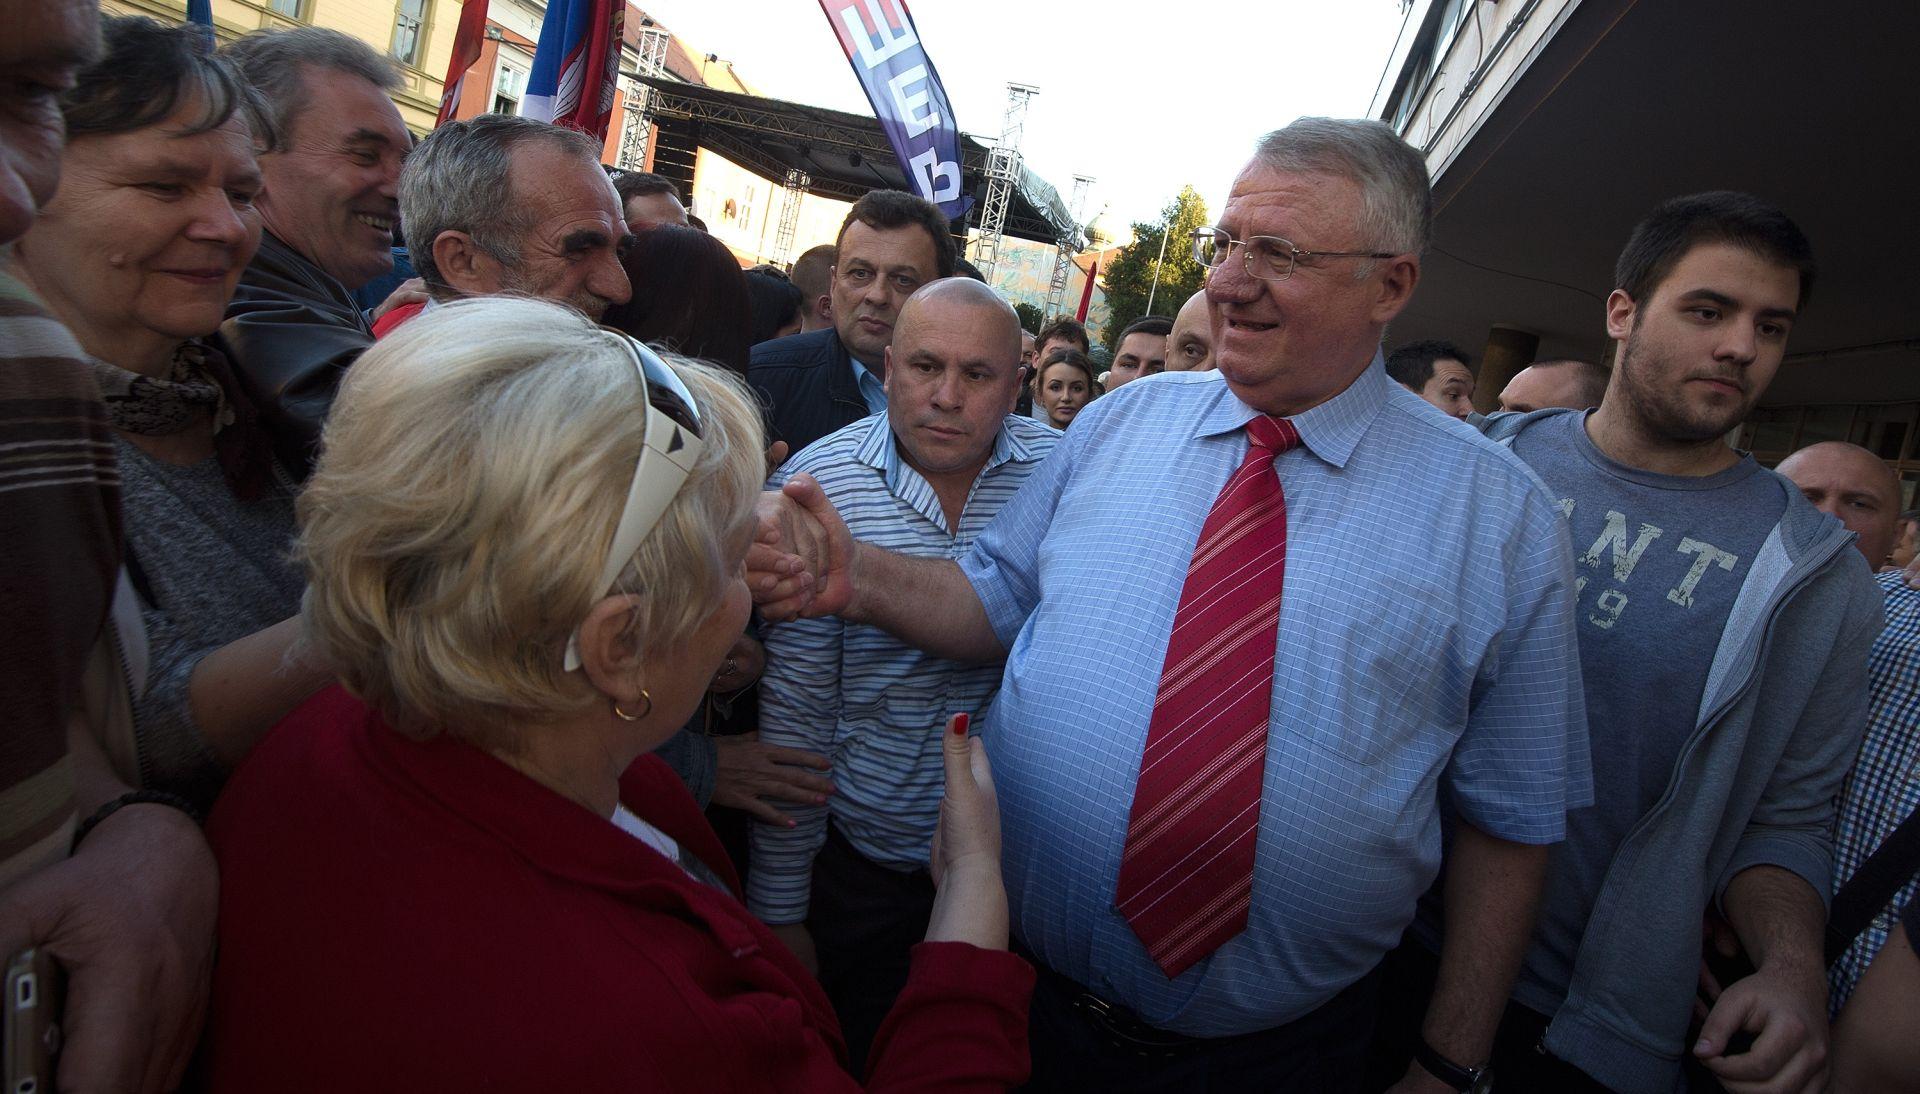 Slovenski komentatori: Presuda Šešelju šokirala žrtve, iznenadila pravnike